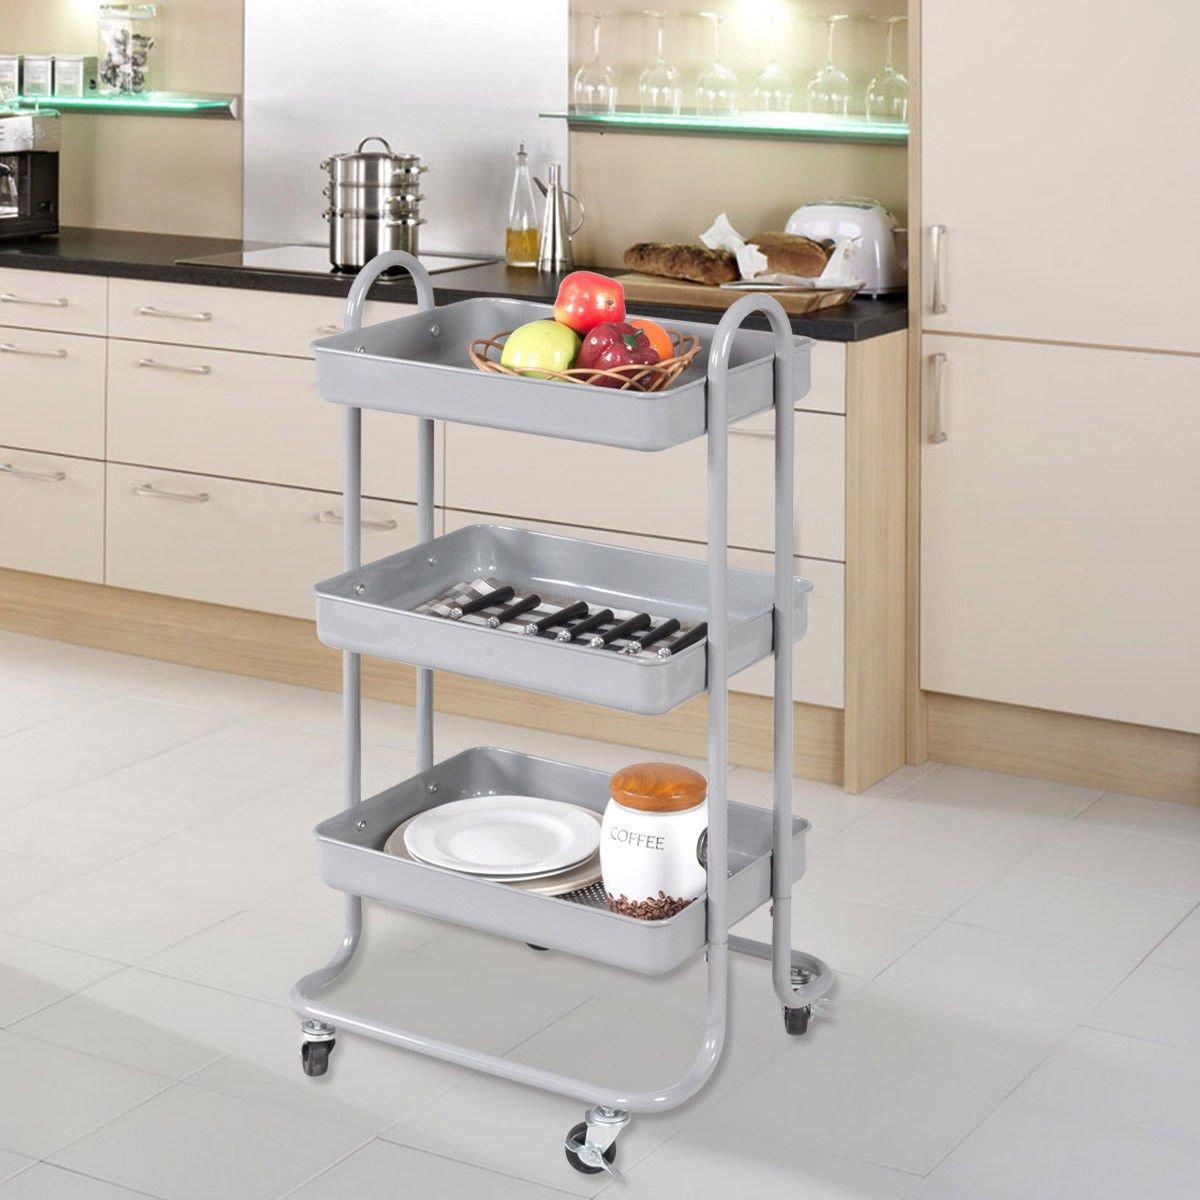 Amazon.com - Giantex 3-Tier Rolling Kitchen Trolley Cart Portable ...